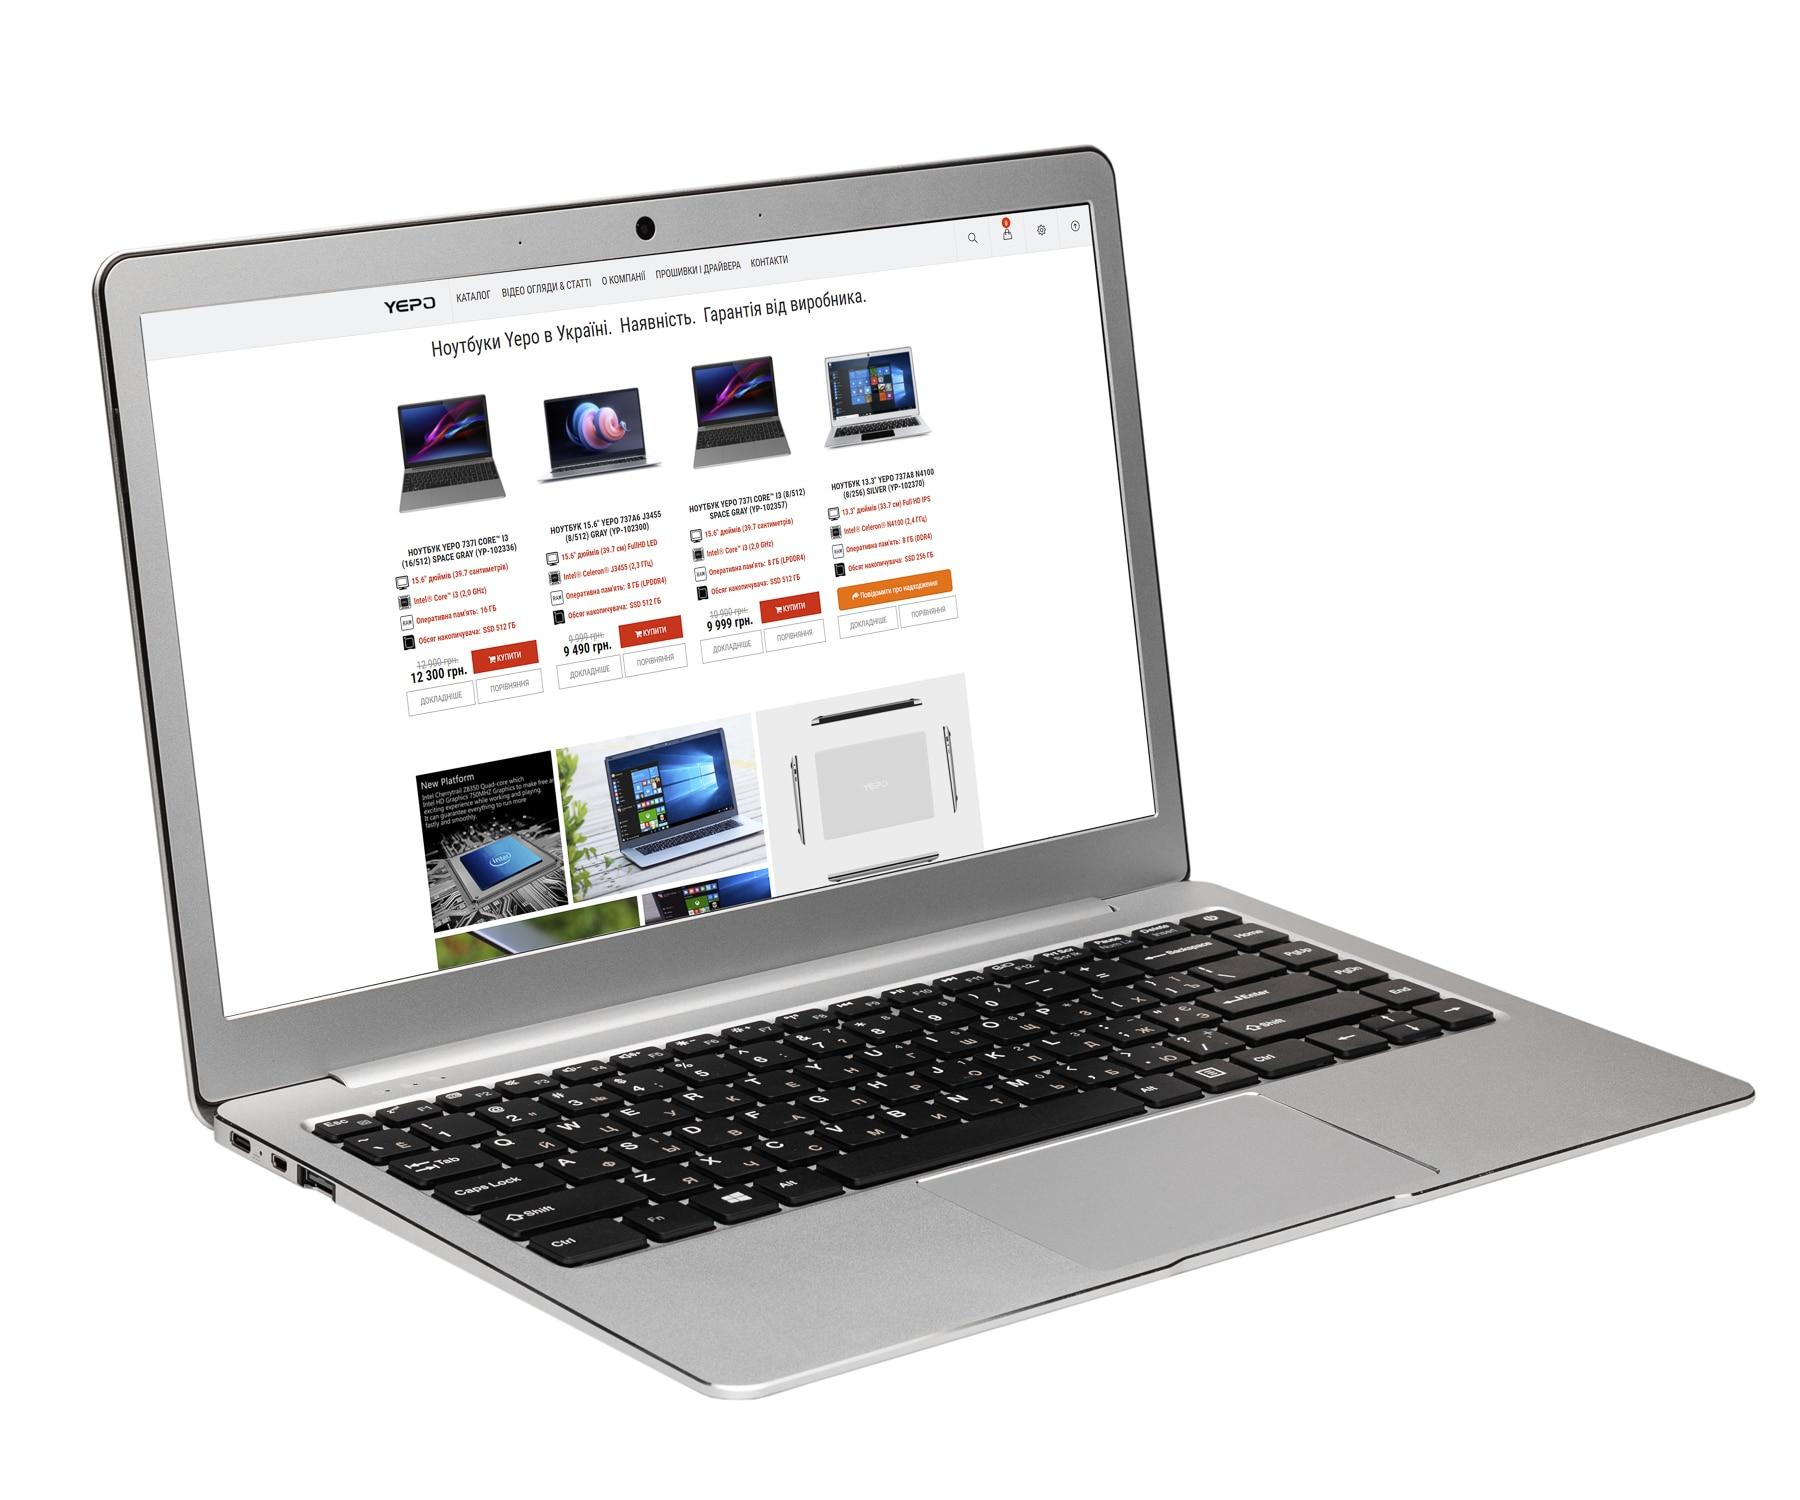 laptop 14 inch intel N3350 windows10 laptops Full metal case OEM laptop